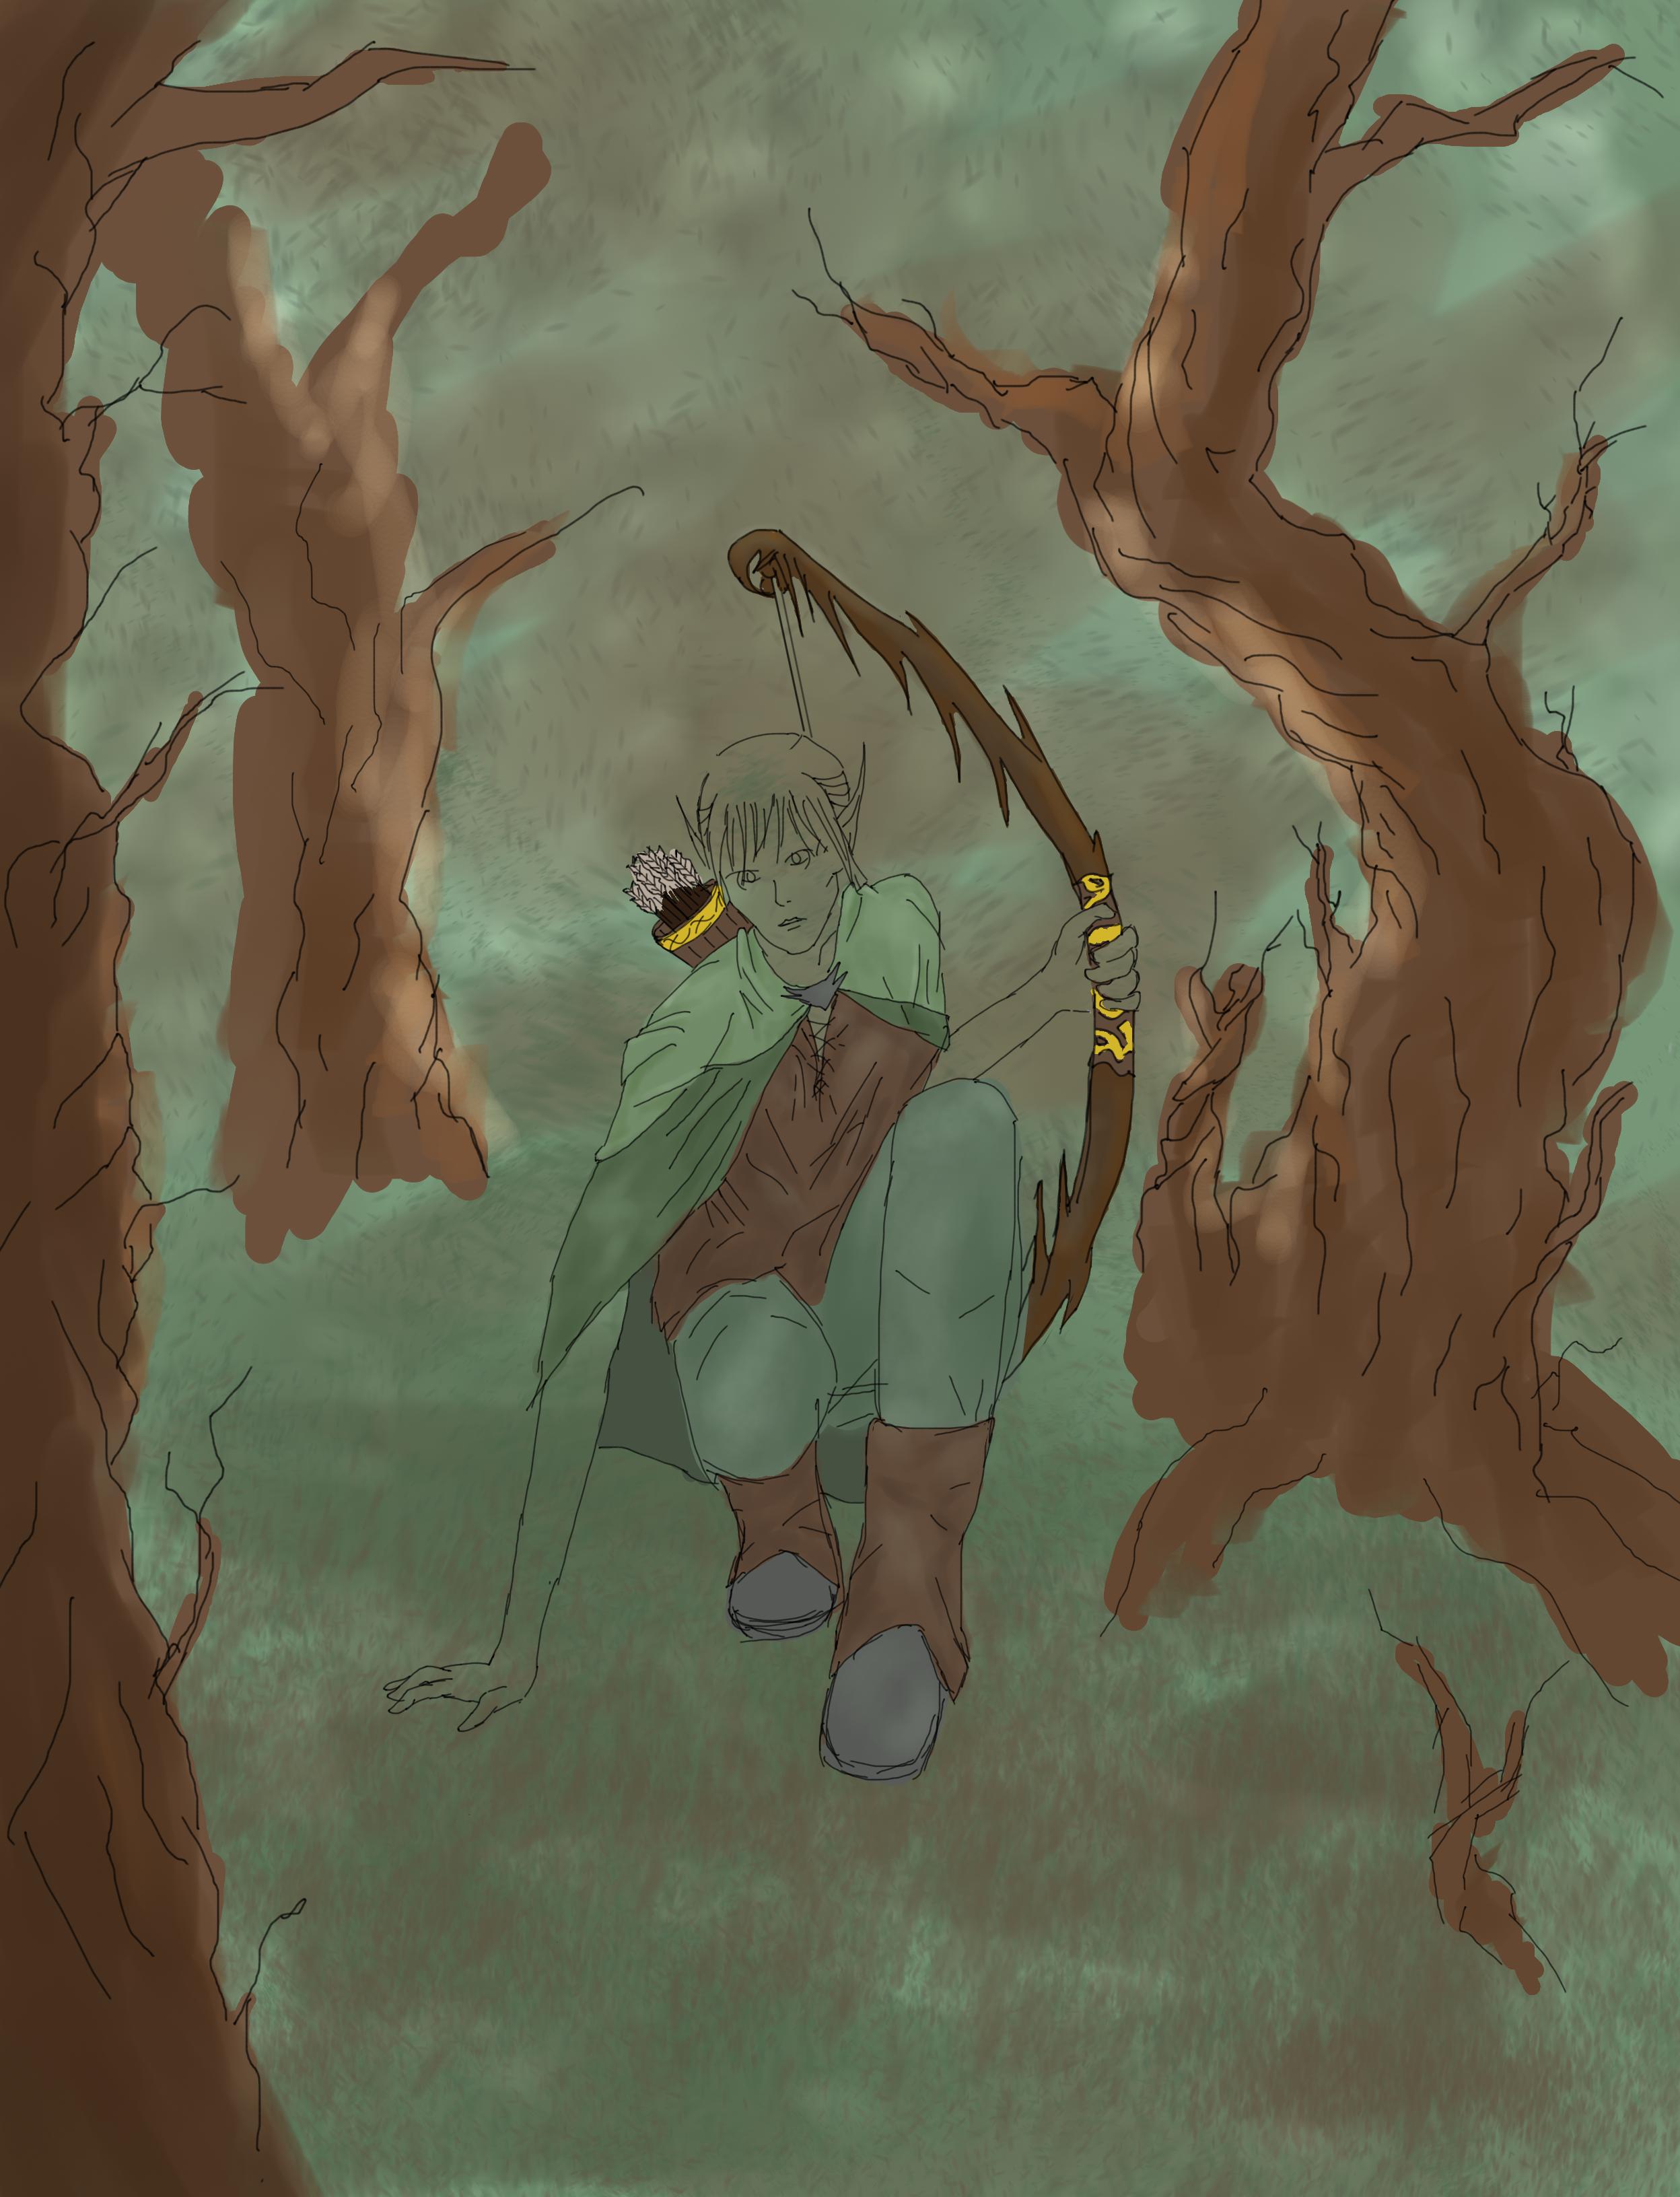 Elvish Ranger {UNFINISHED} by Storming777